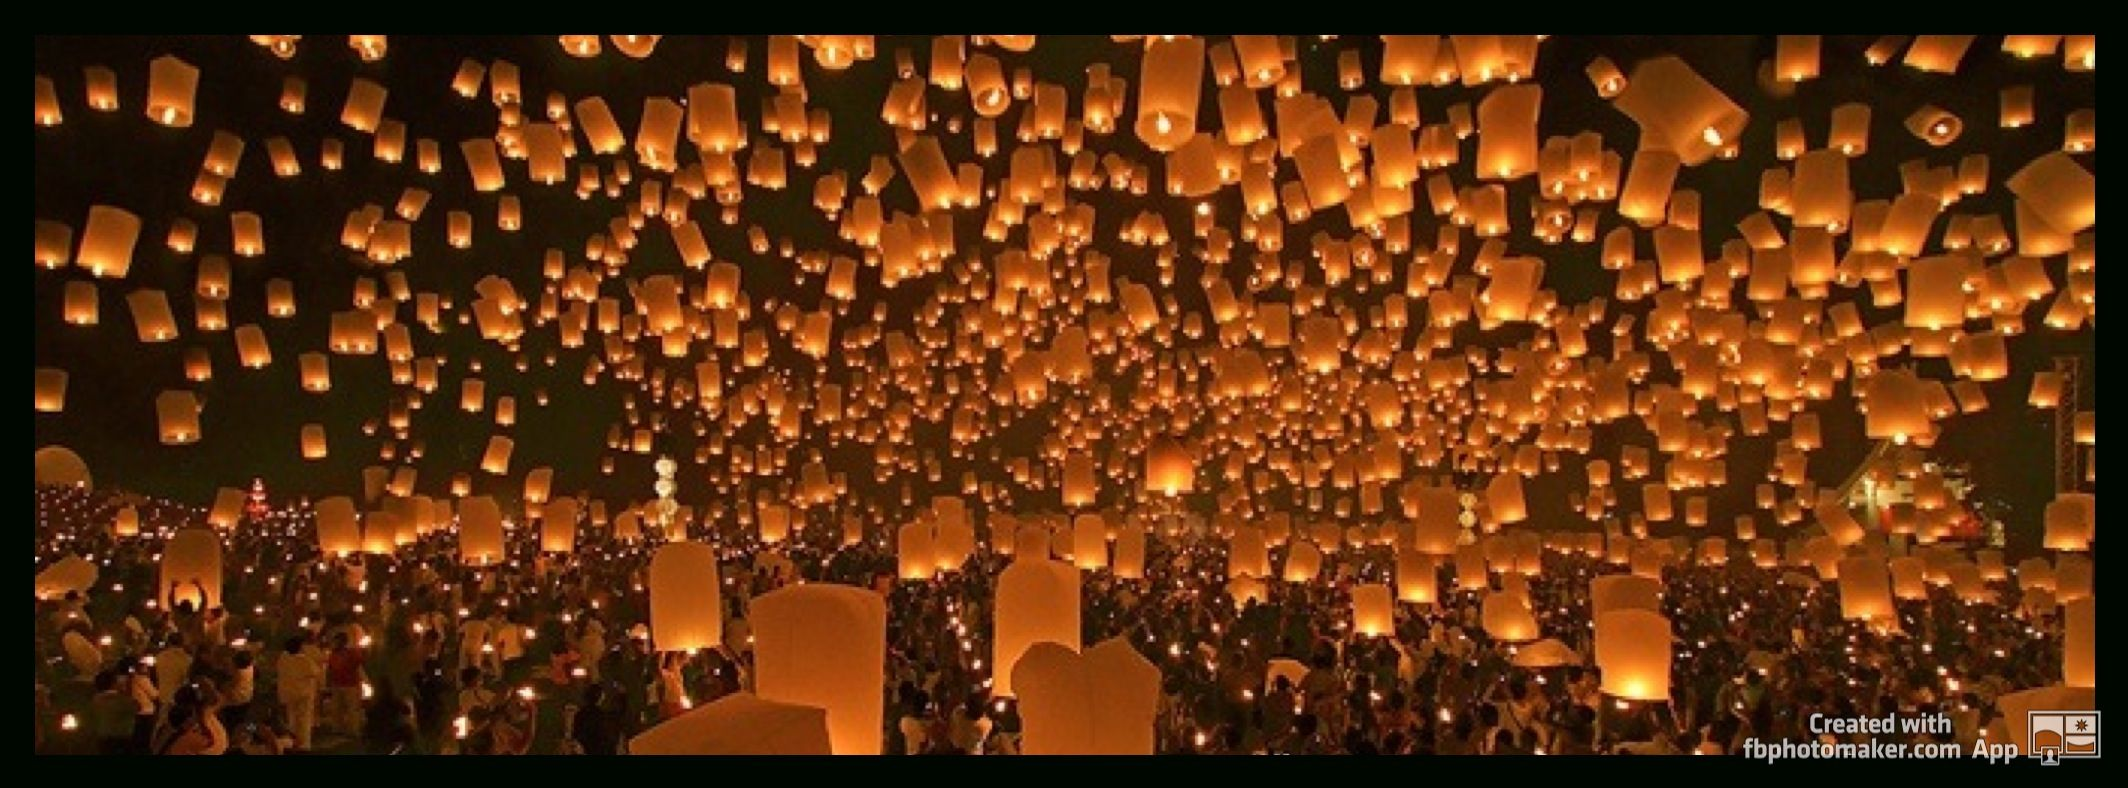 Lanterns, beautiful, orange and black - facebook cover photo, fb covers